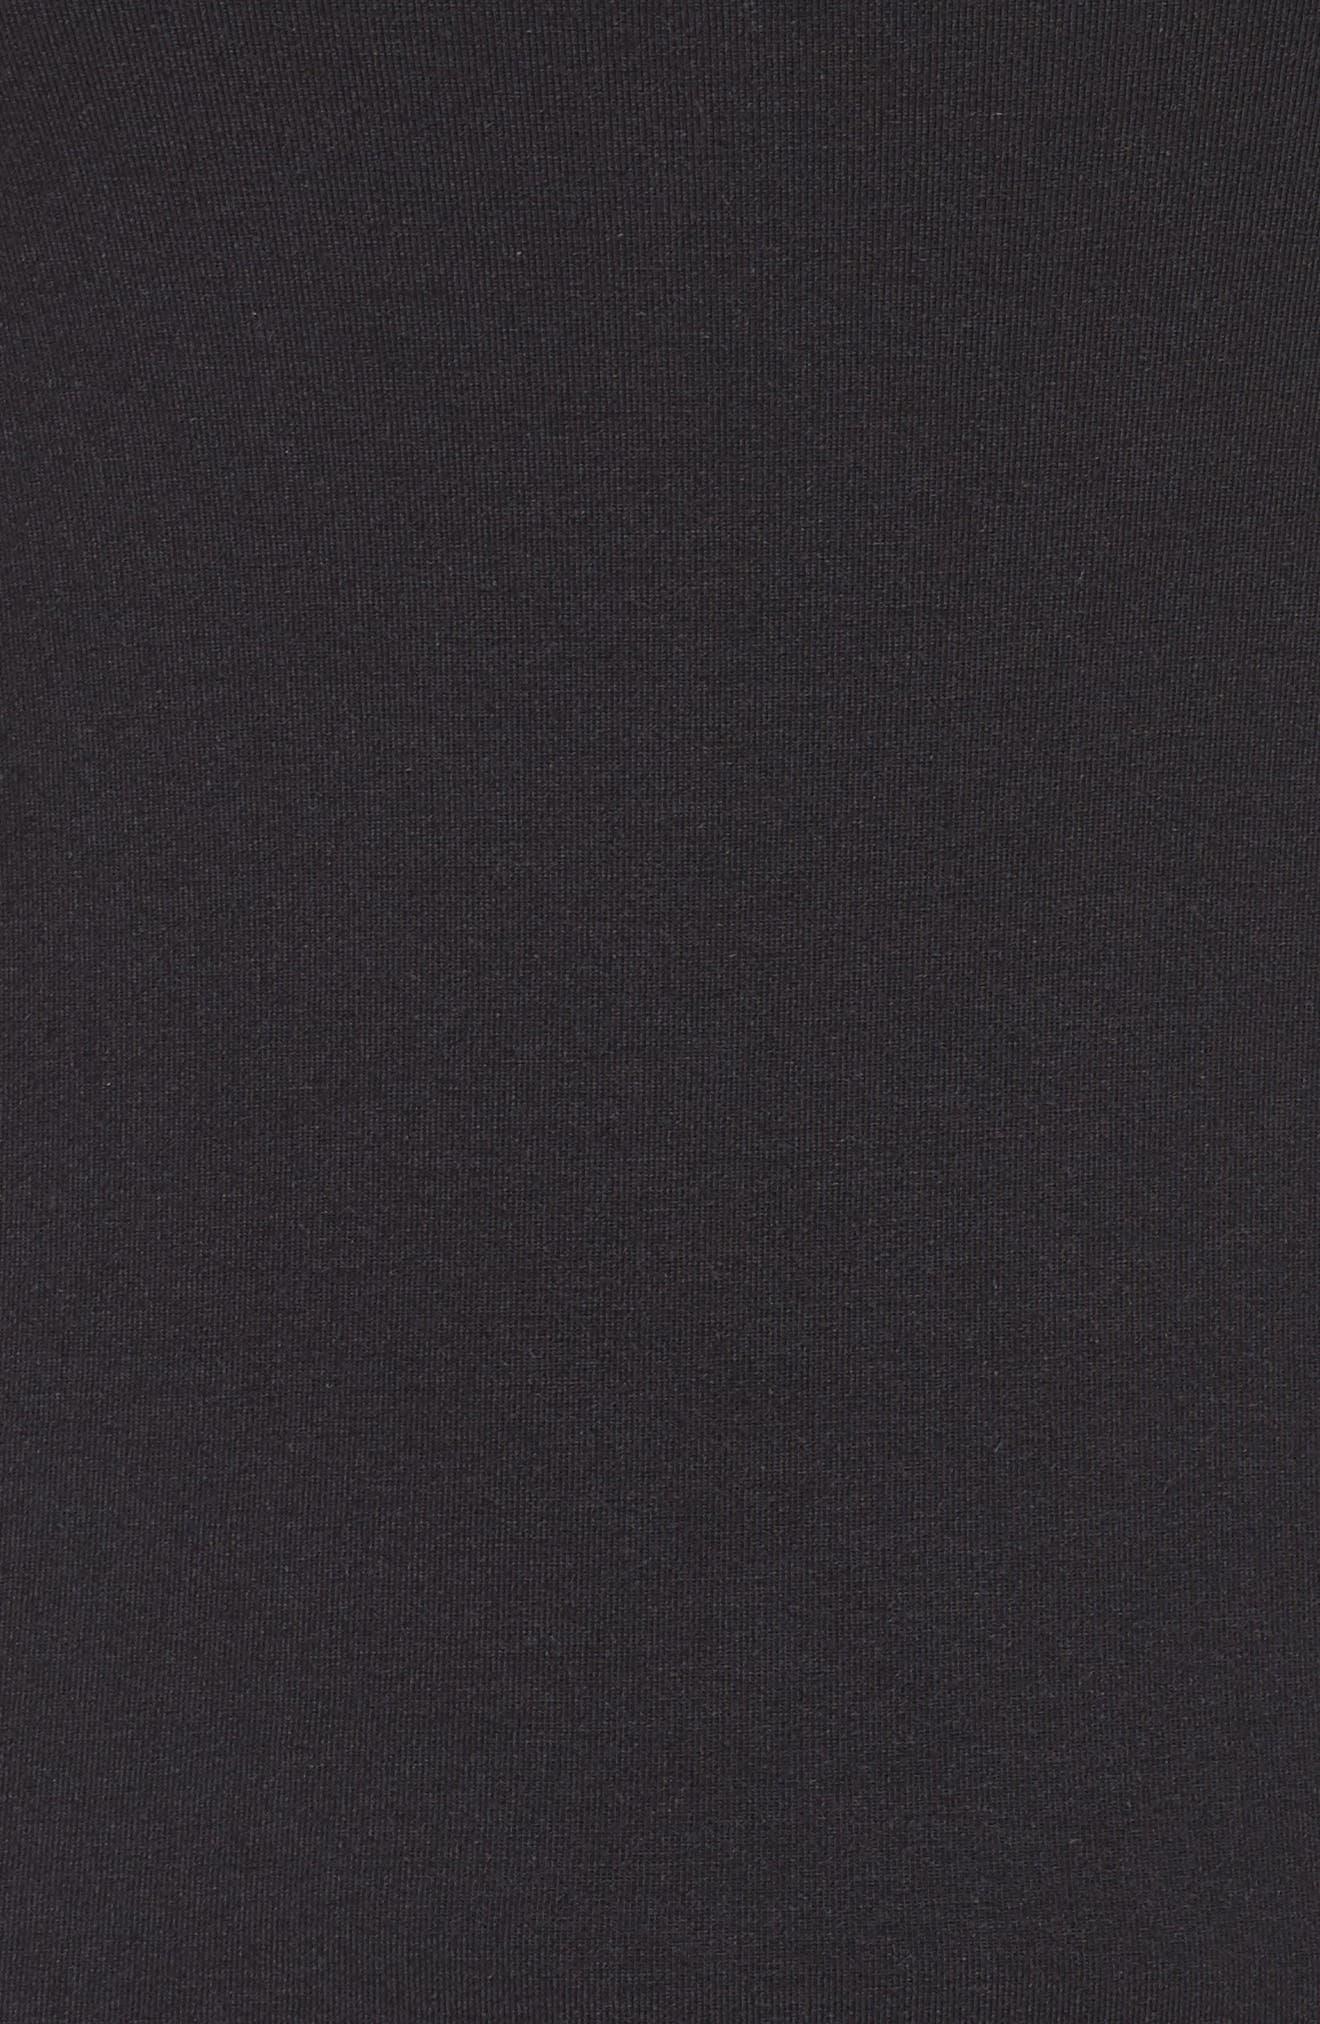 Camisole,                             Alternate thumbnail 5, color,                             Black